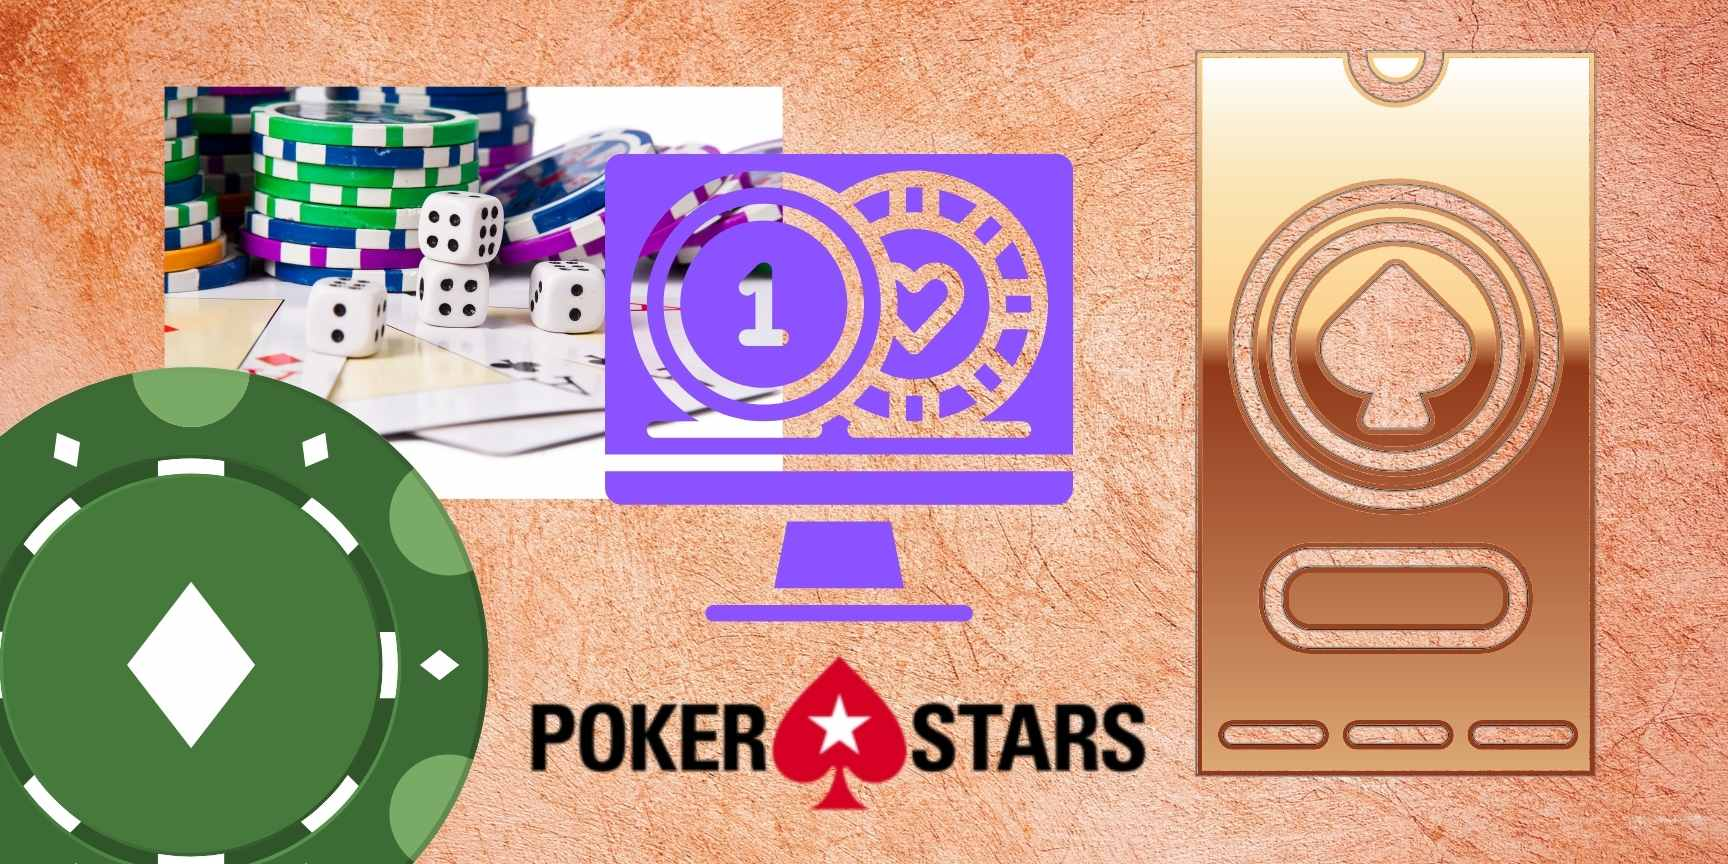 pokerstars devices